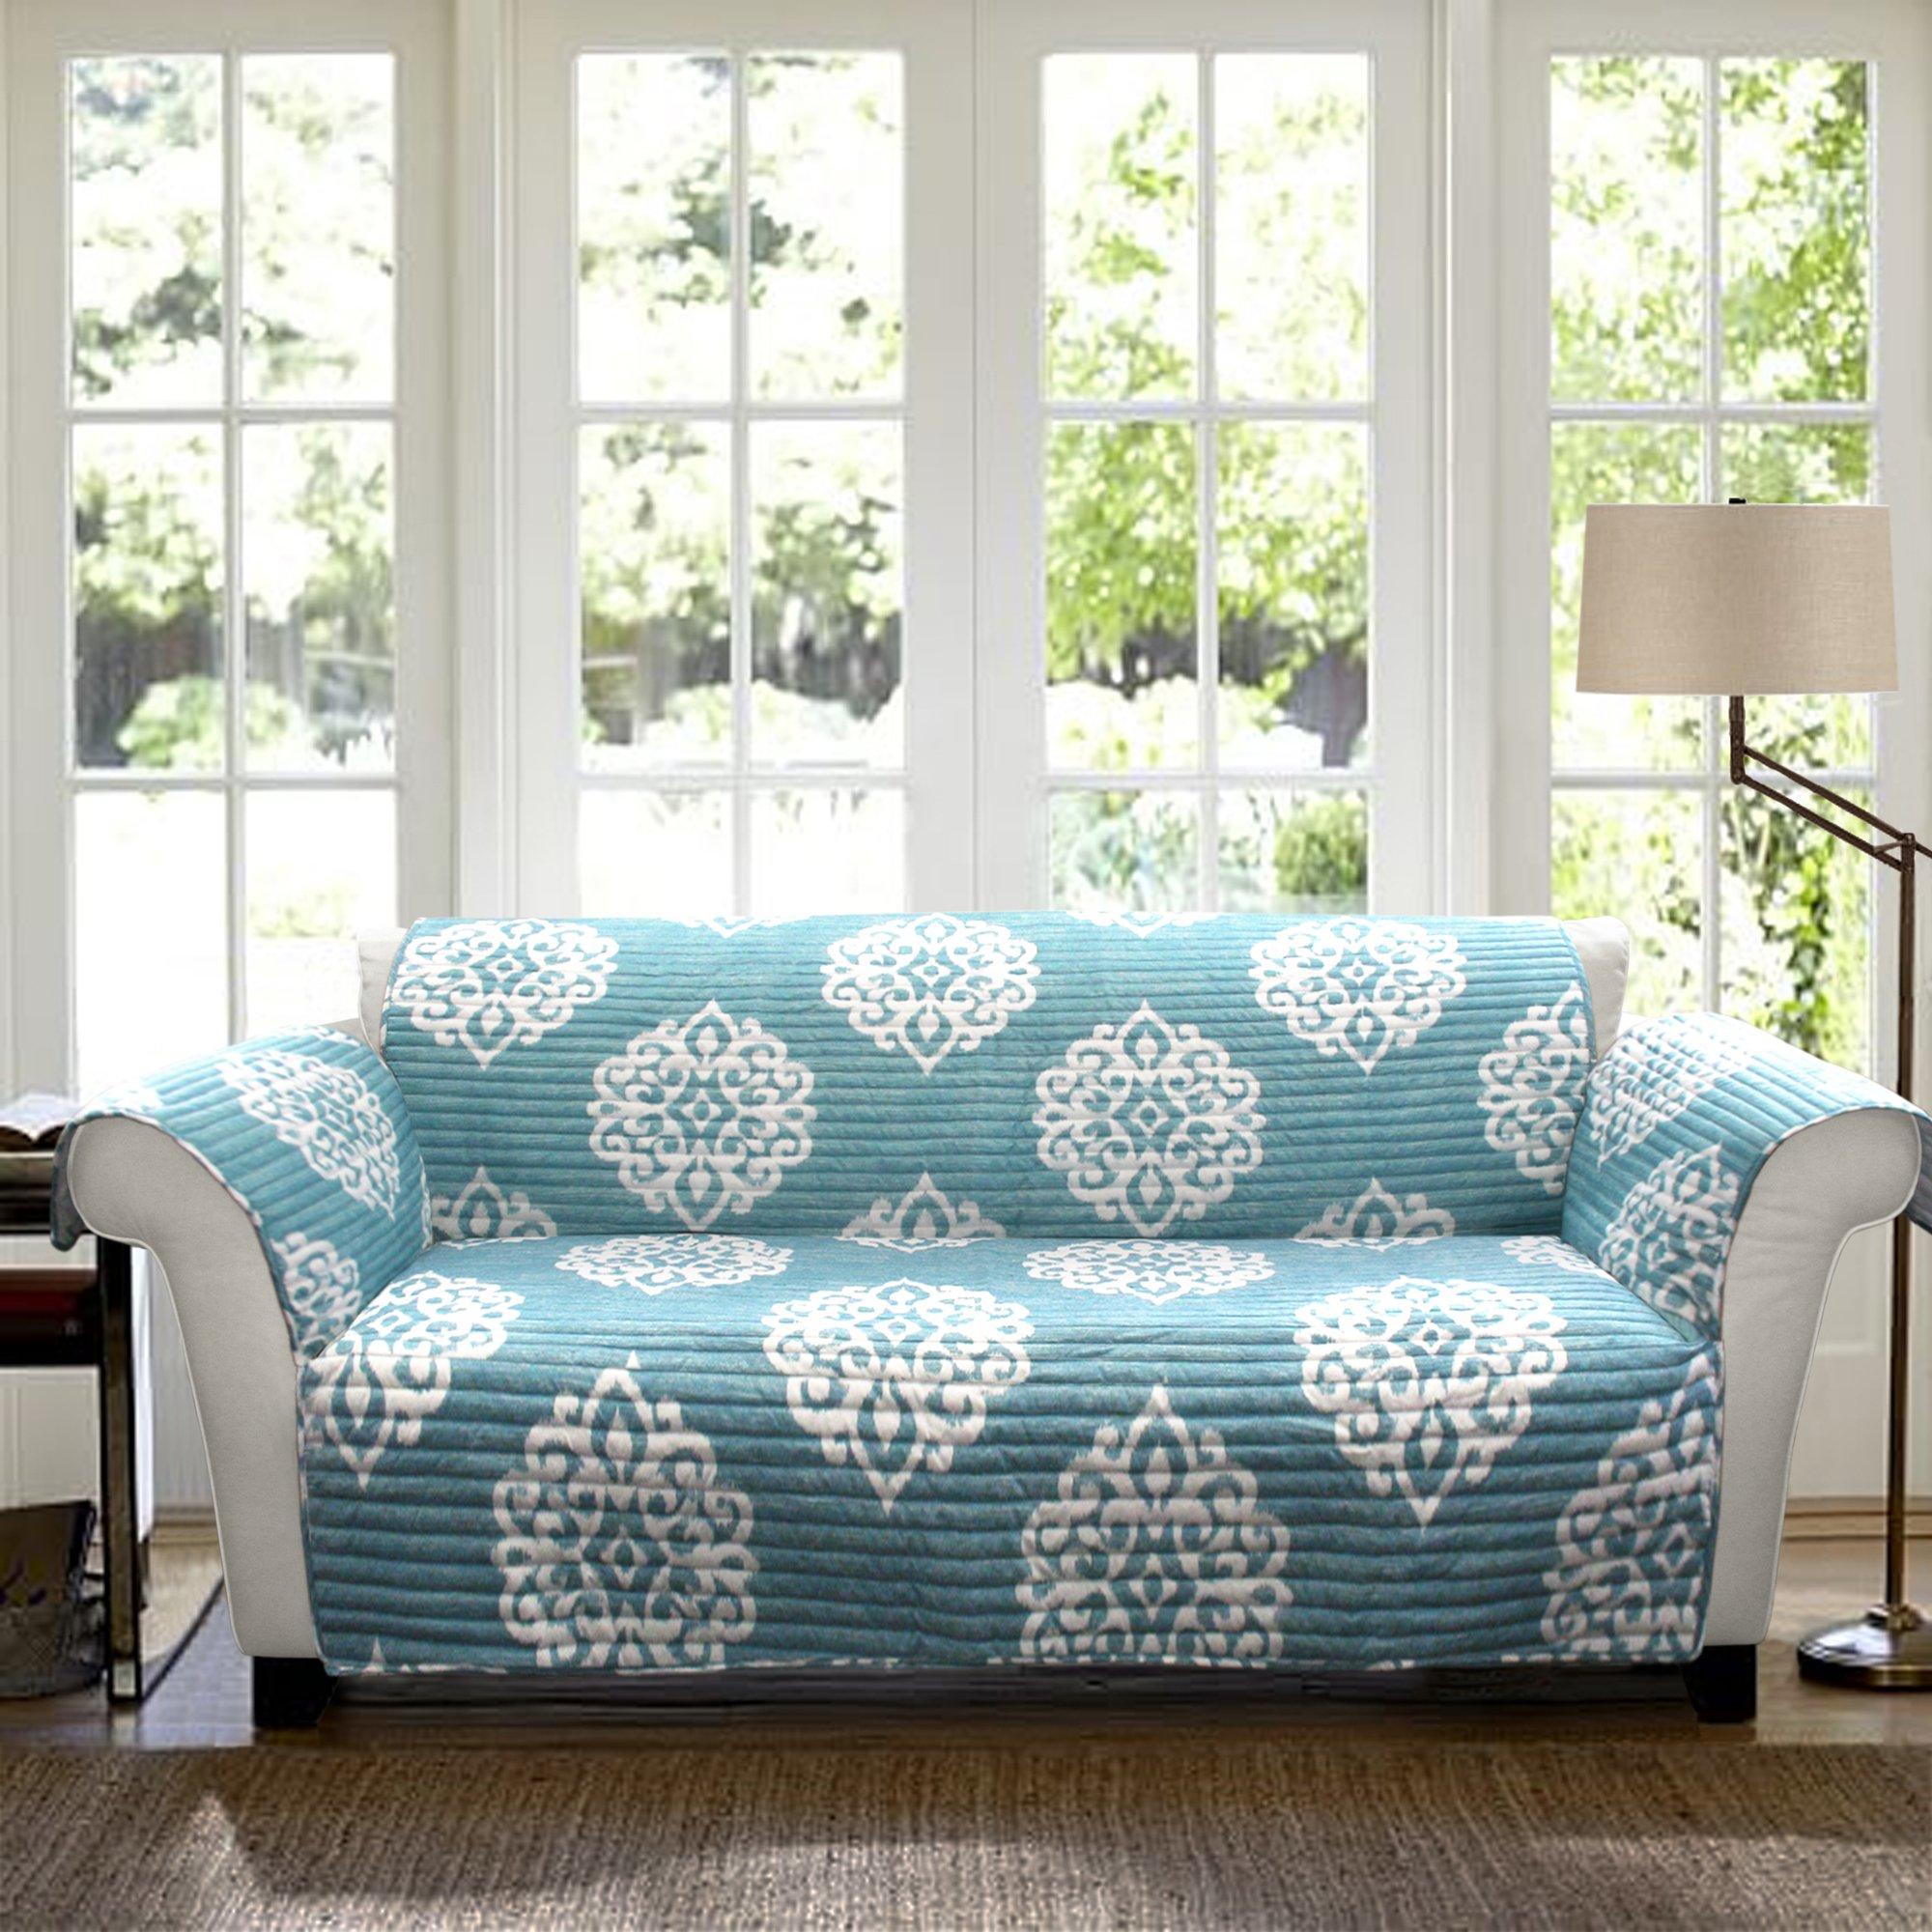 Lush Decor Sohpie Slipcover/Furniture Protector for Sofa, Blue